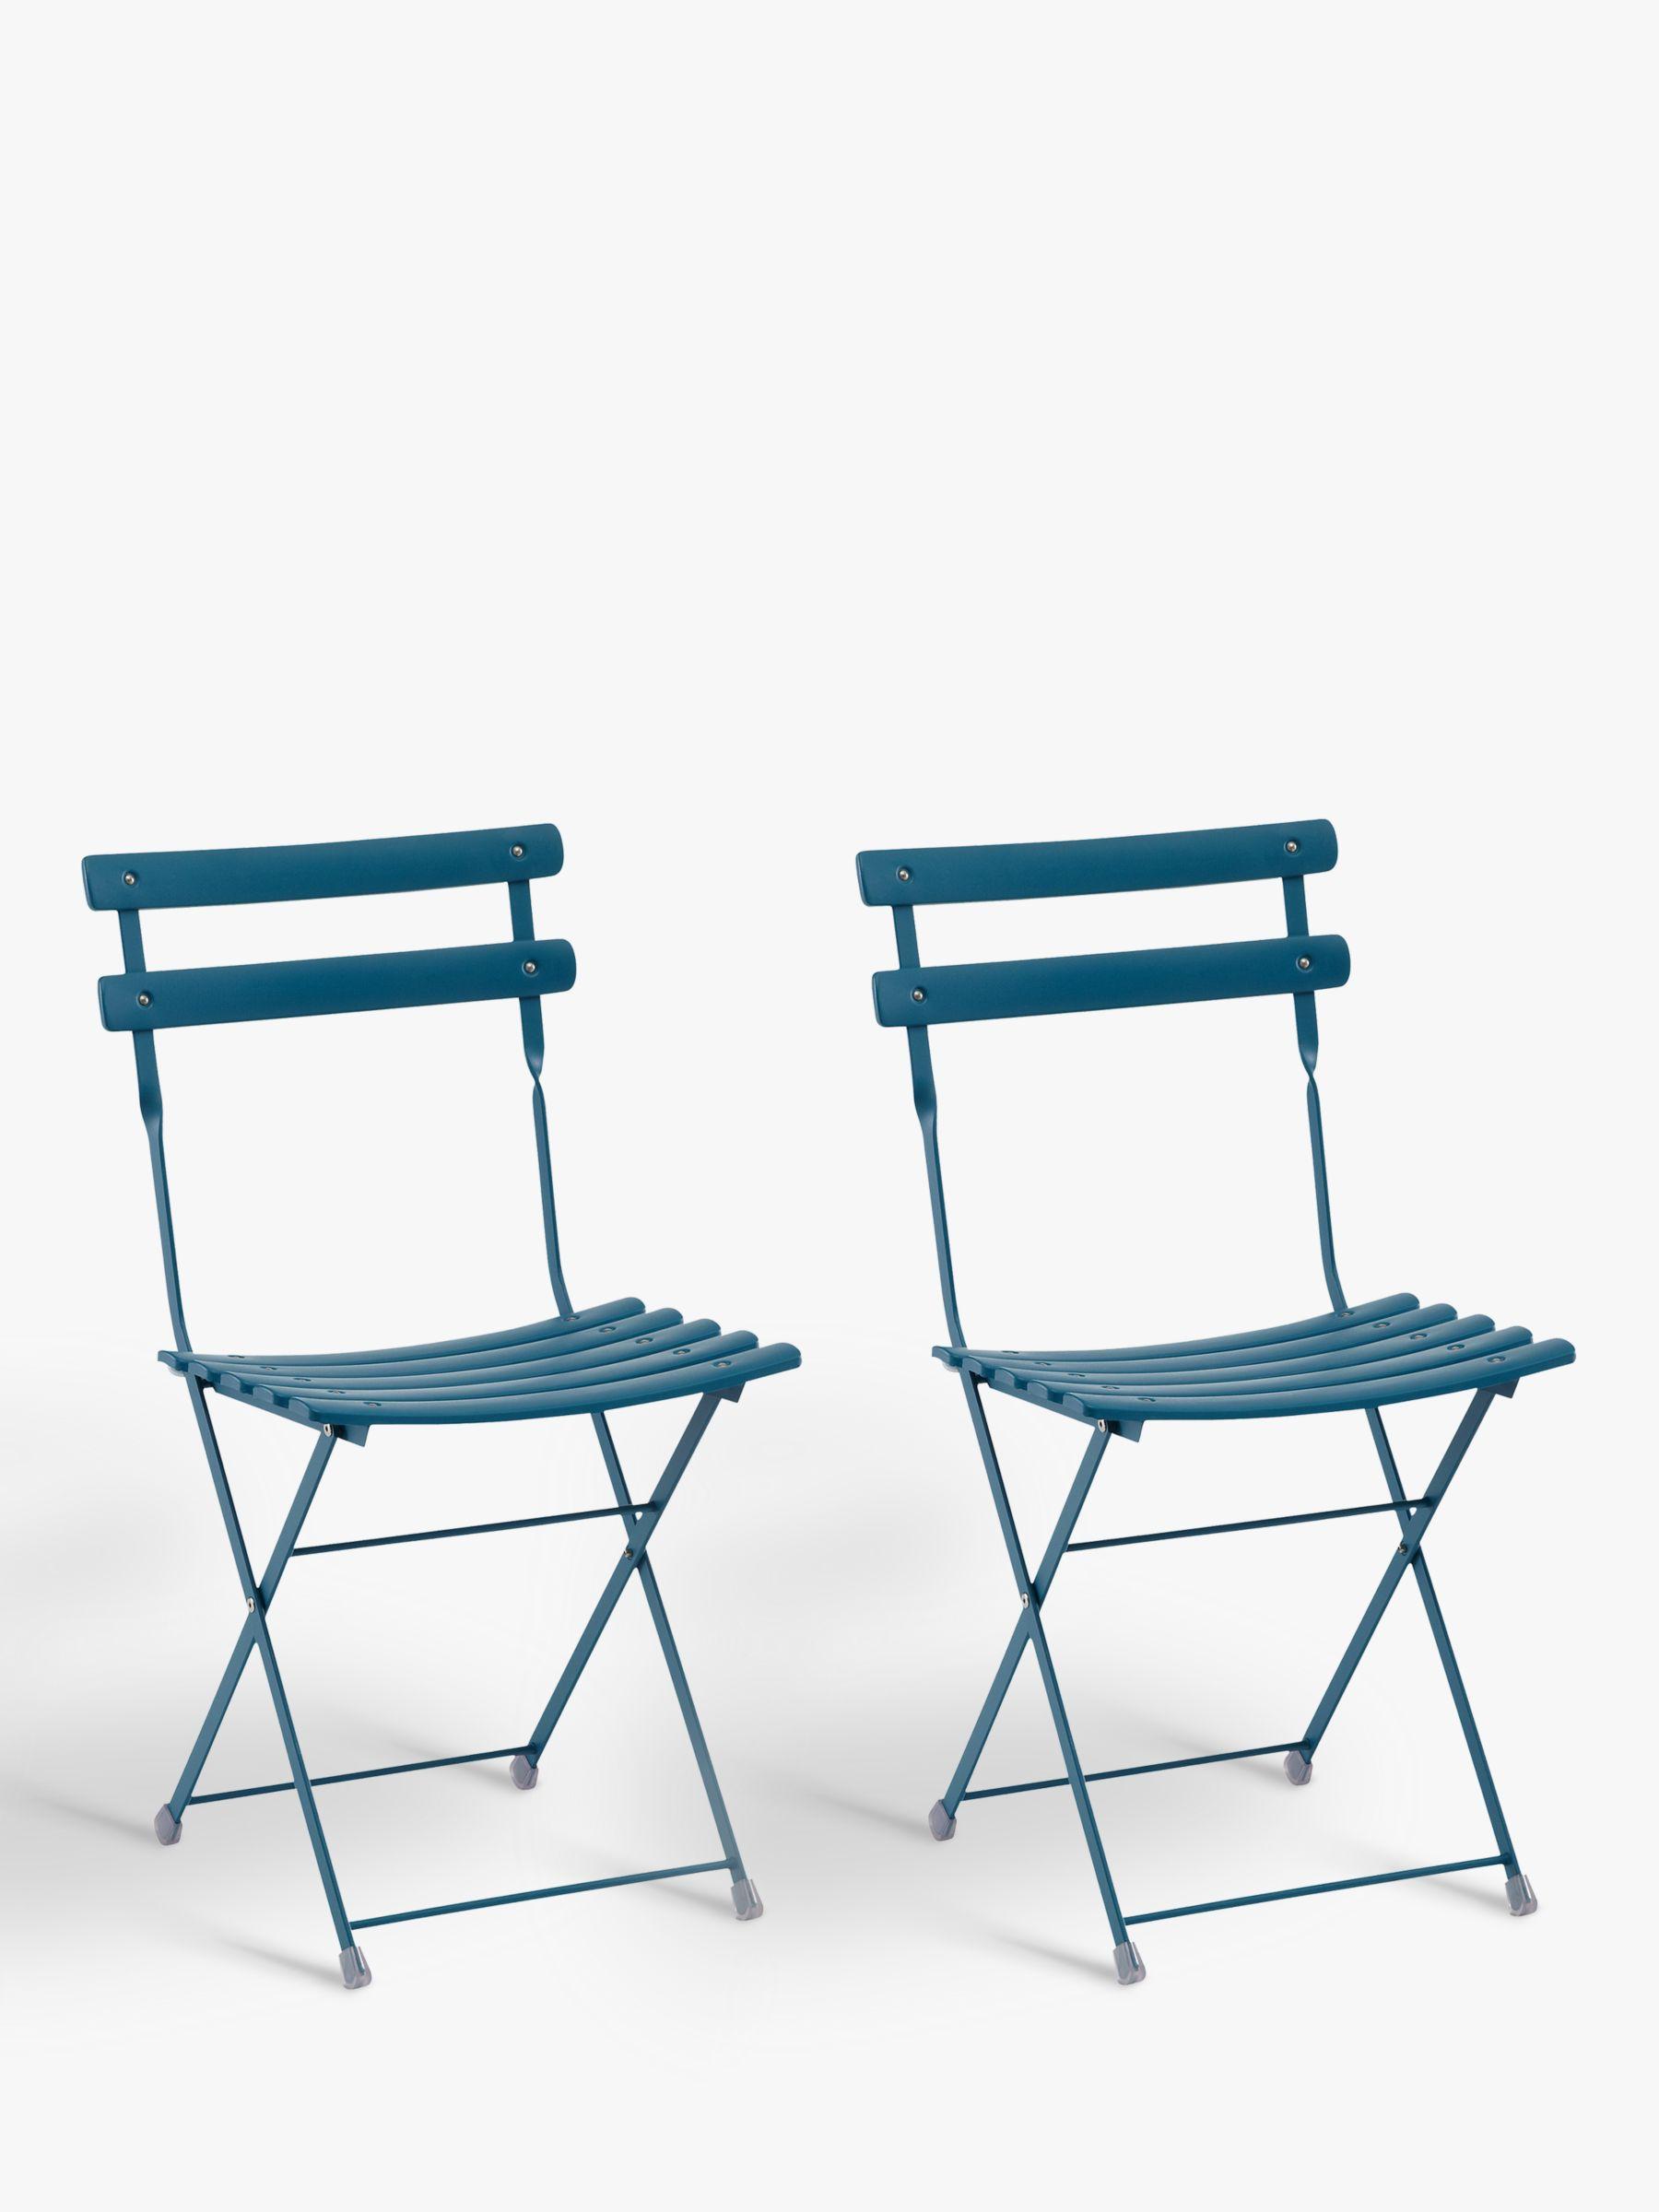 EMU EMU Arc En Ciel Garden Chairs, Set of 2, Blue